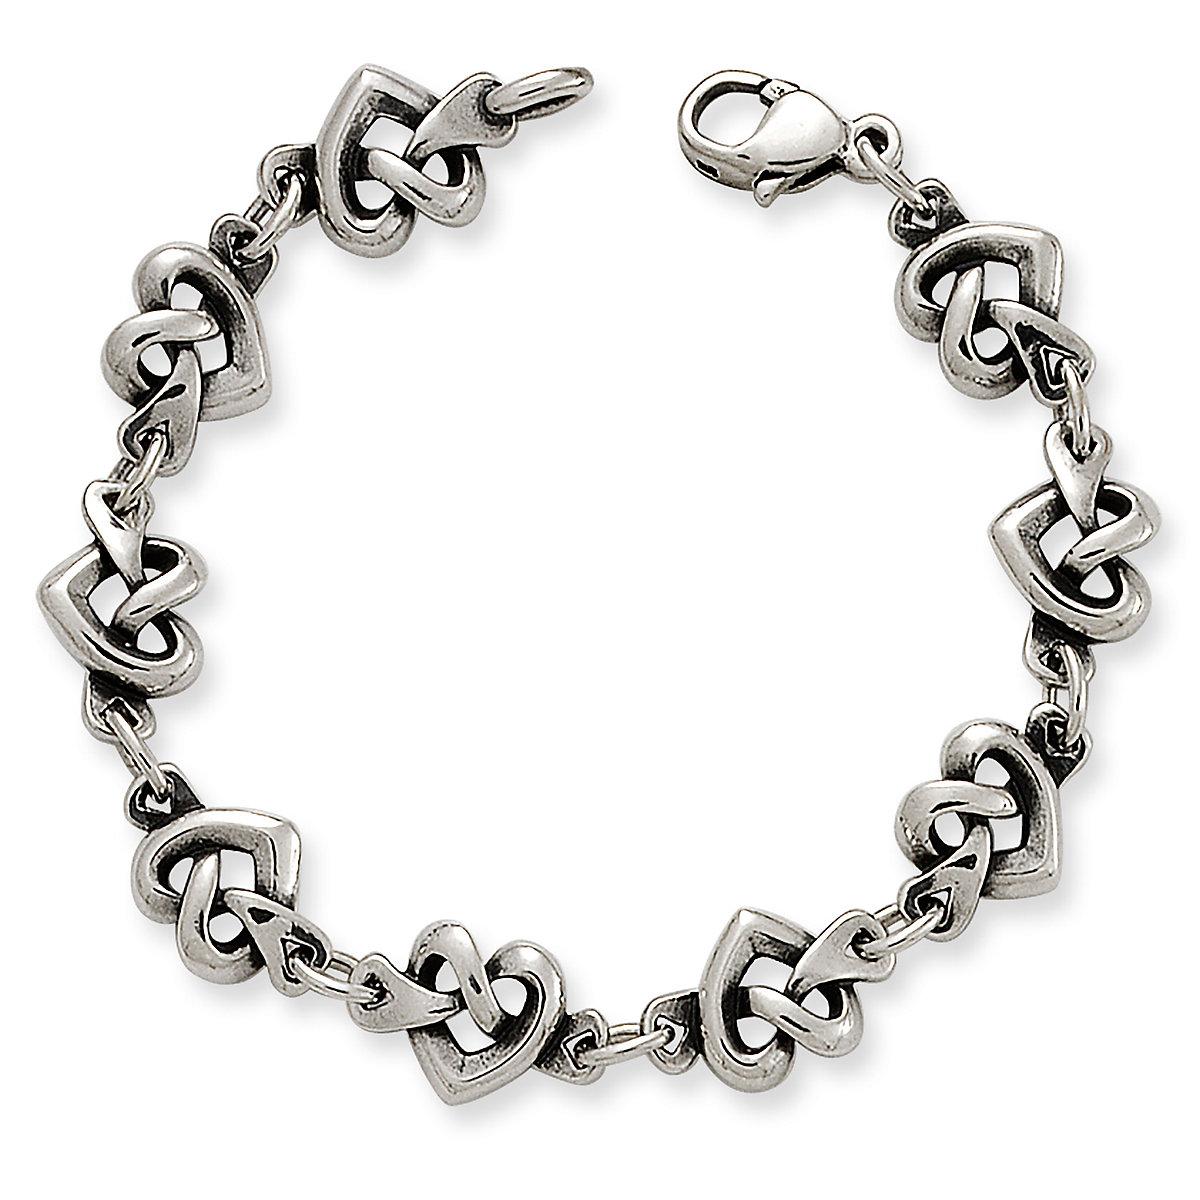 Bangle Cuff Charm Bracelets James Avery